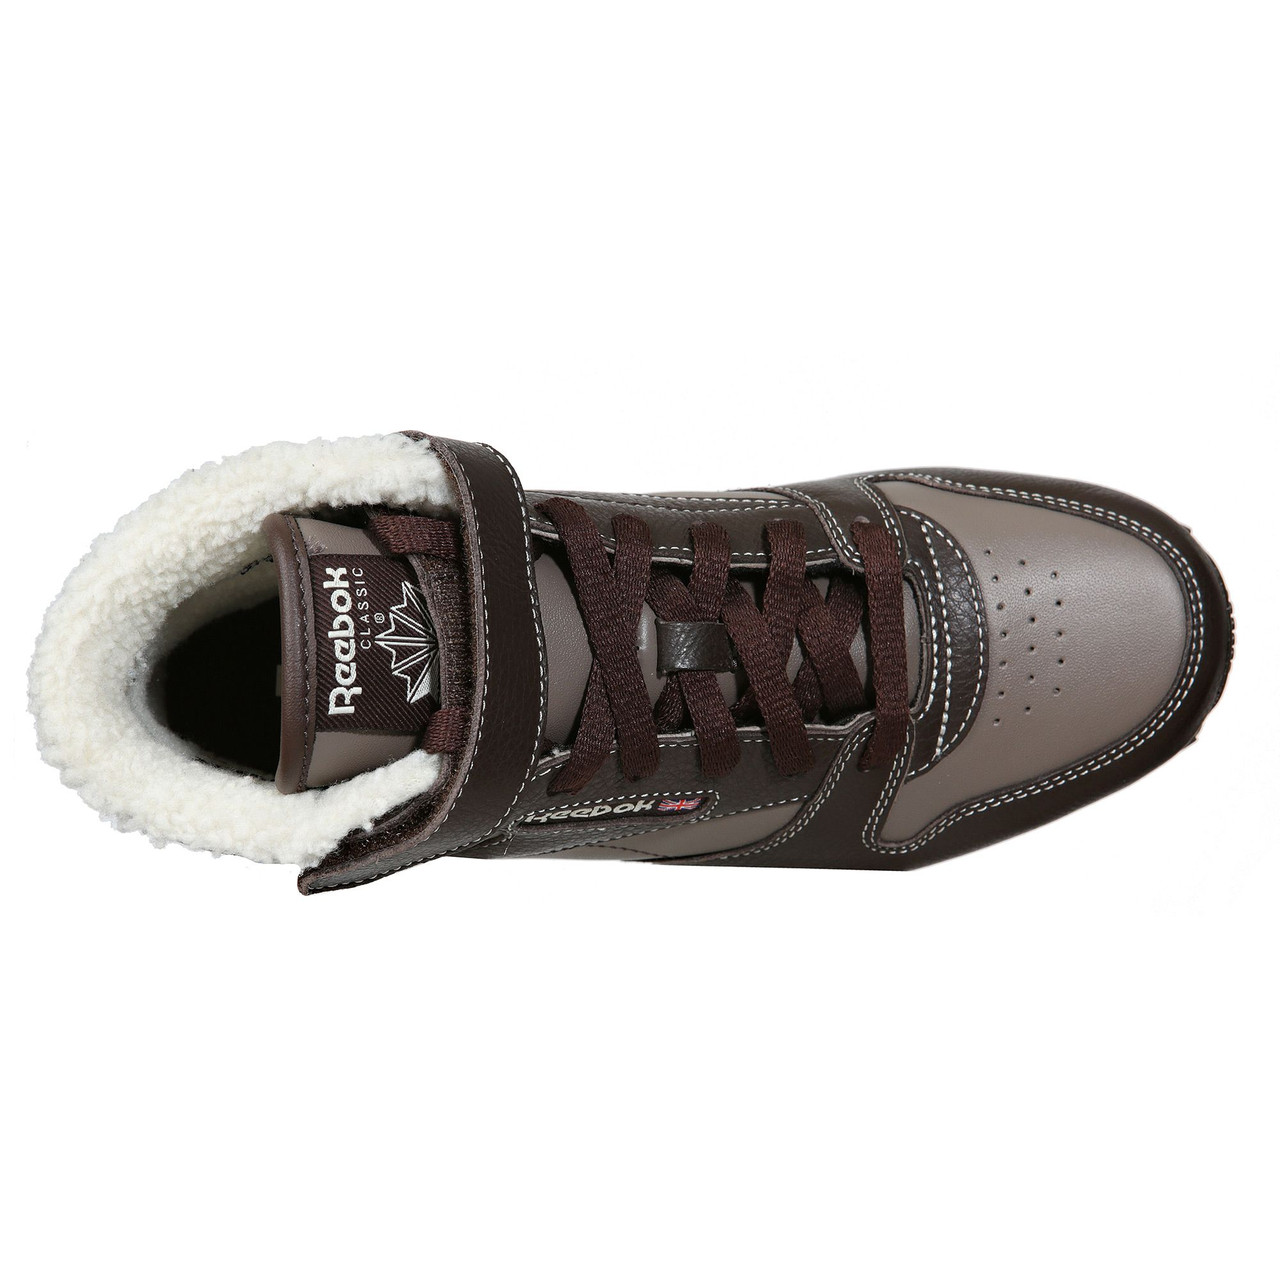 b845a47f071f ... Детские утепленные кроссовки Reebok CLASSIC LEATHER (Артикул  M46338),  фото 6